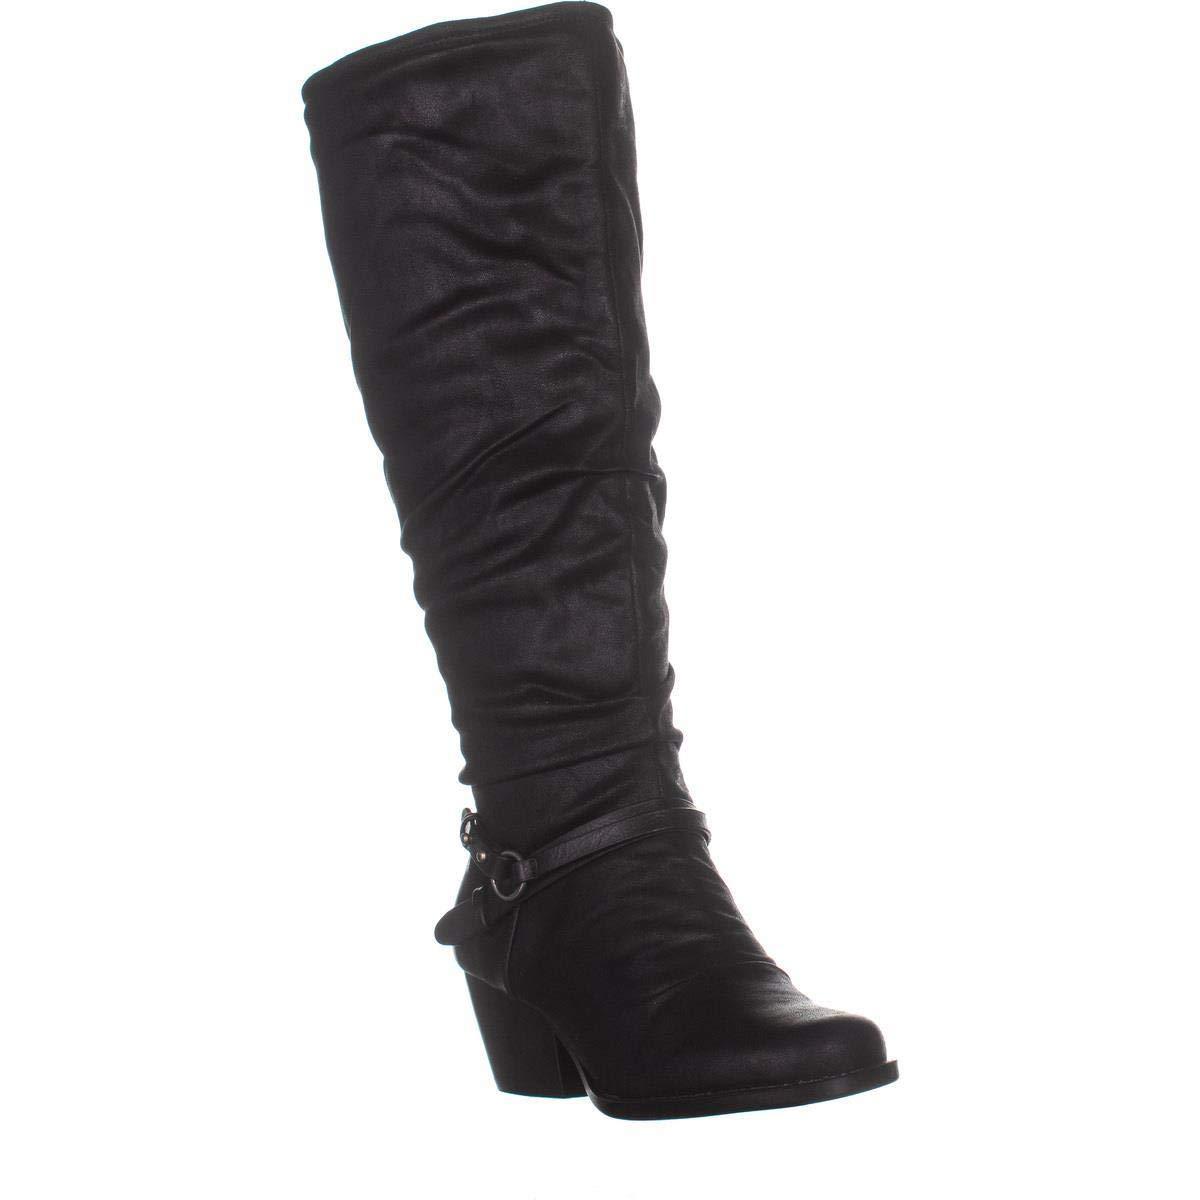 Black Baretraps Roz2 Wide Calf Block Heel Riding Boots, Black